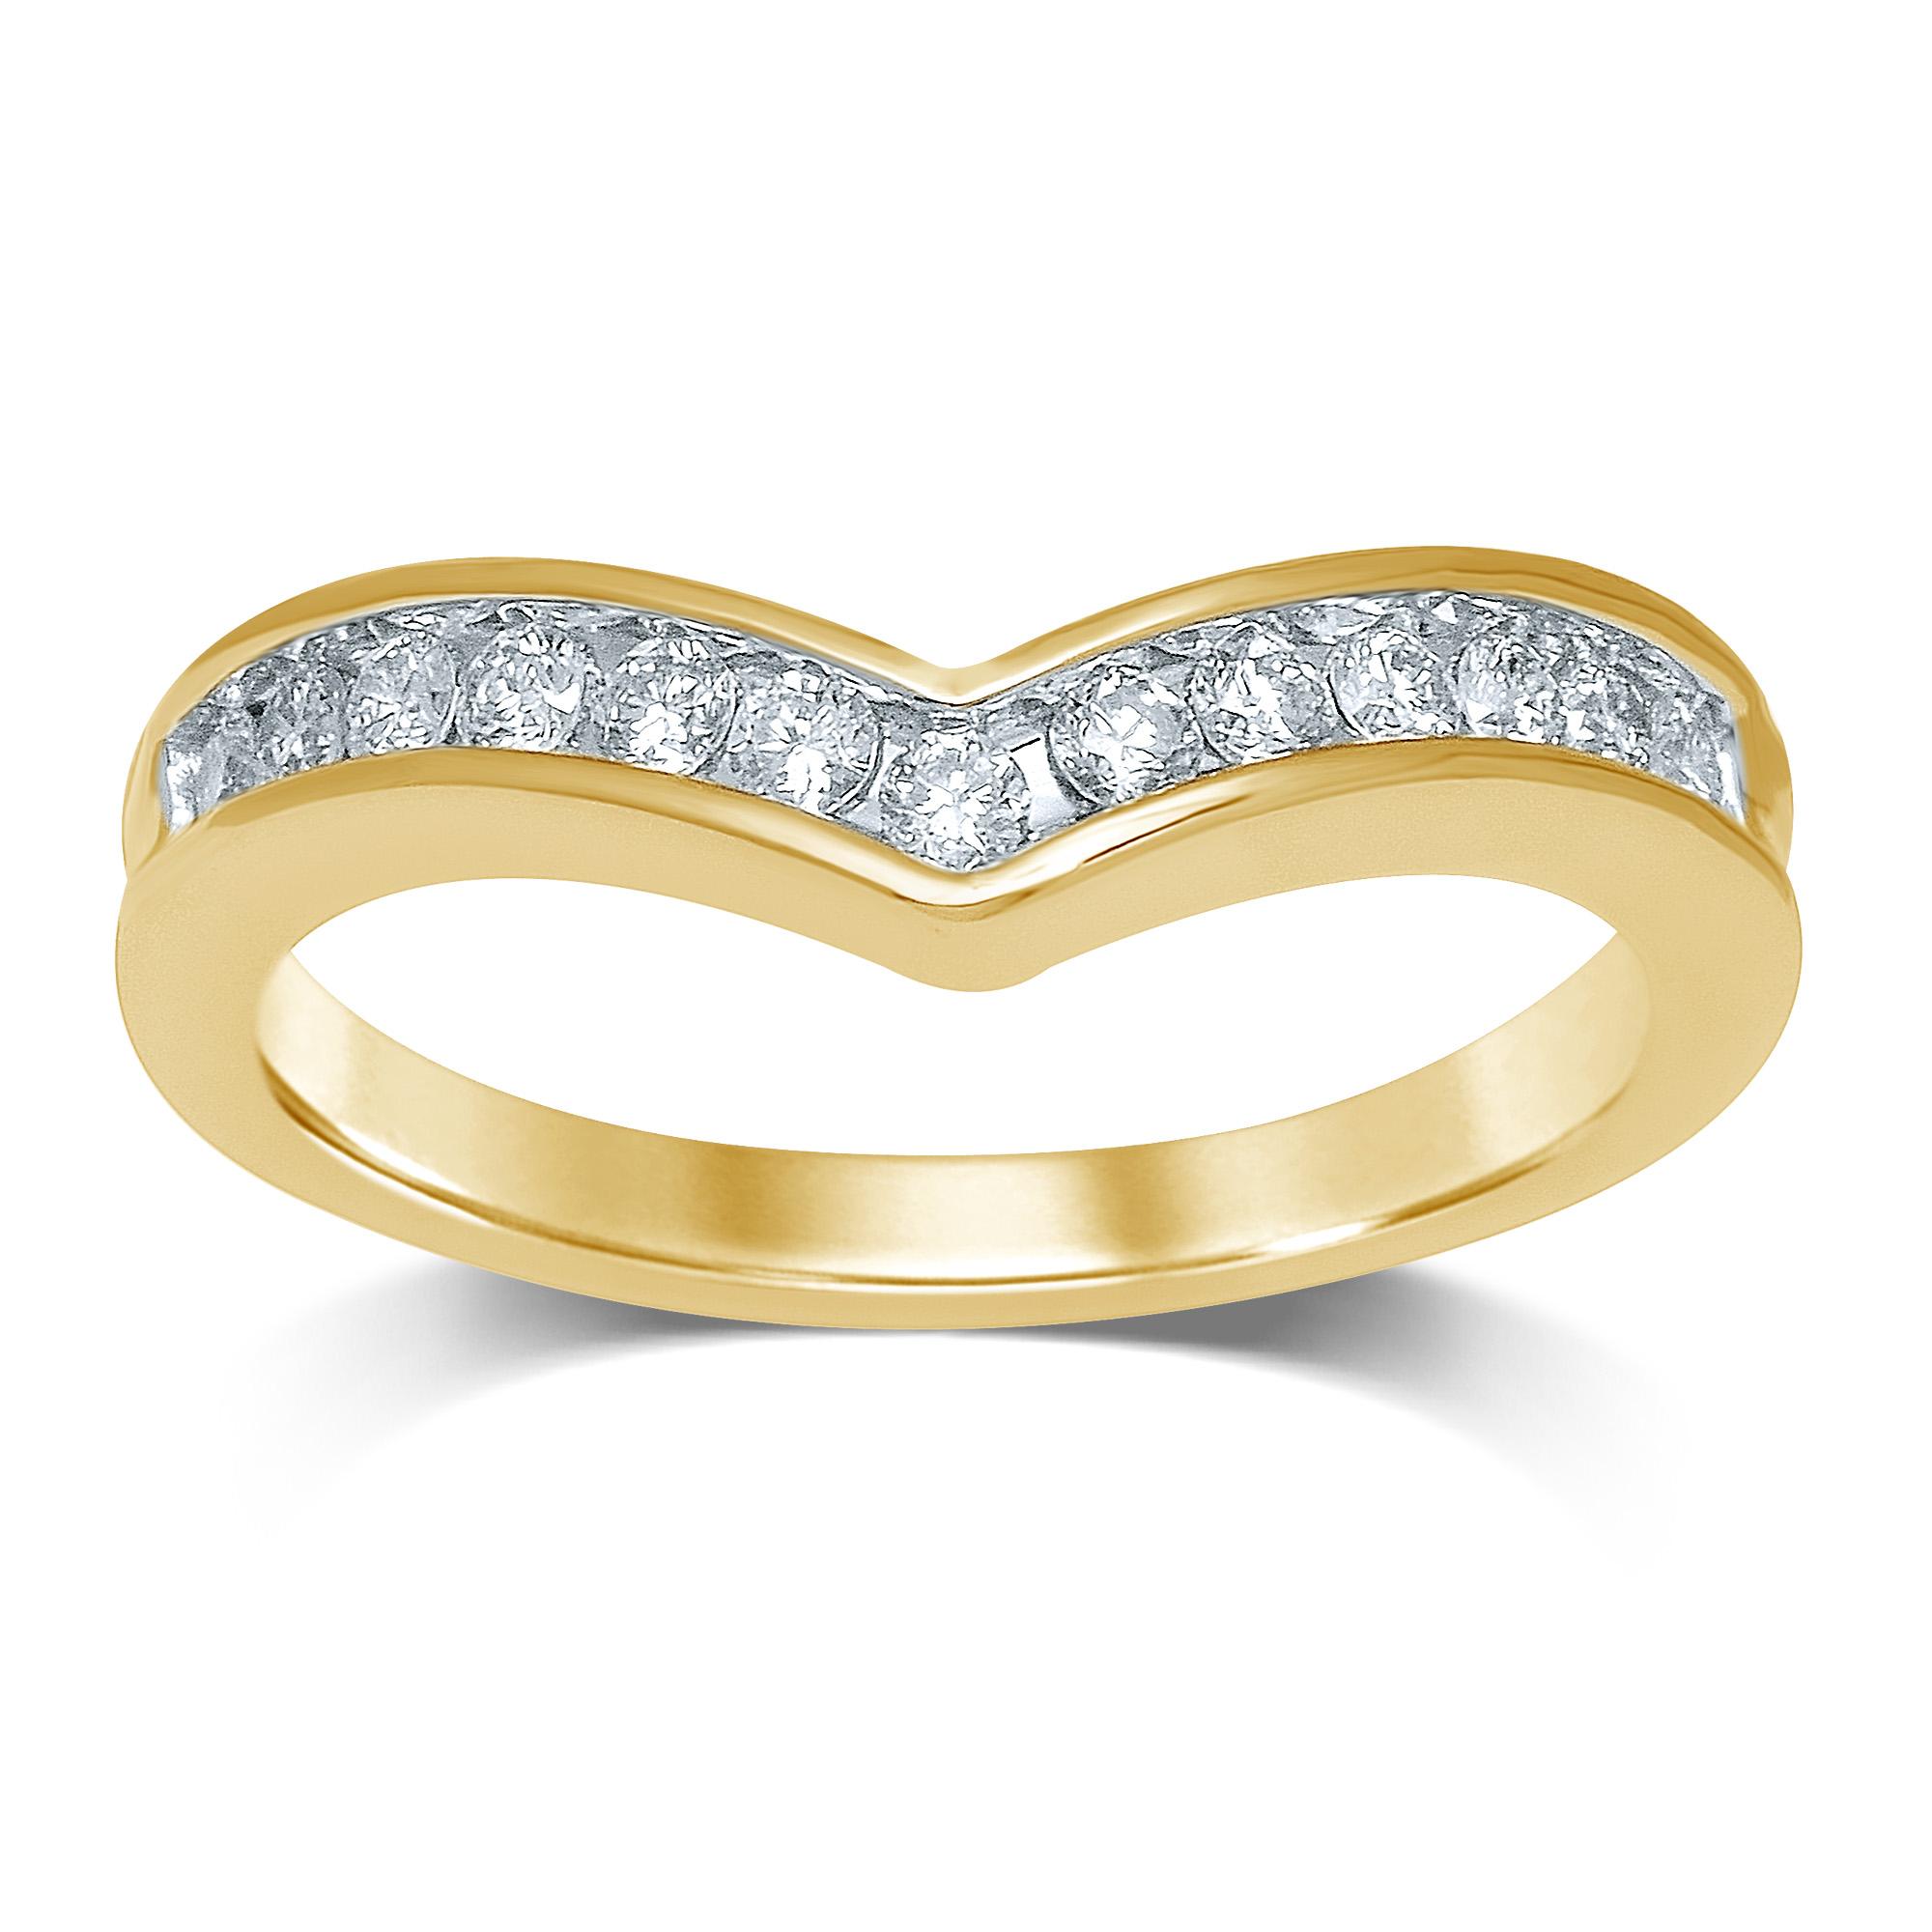 9ct Yellow Gold Contour Diamond Ring with 13 Brilliant Diamonds